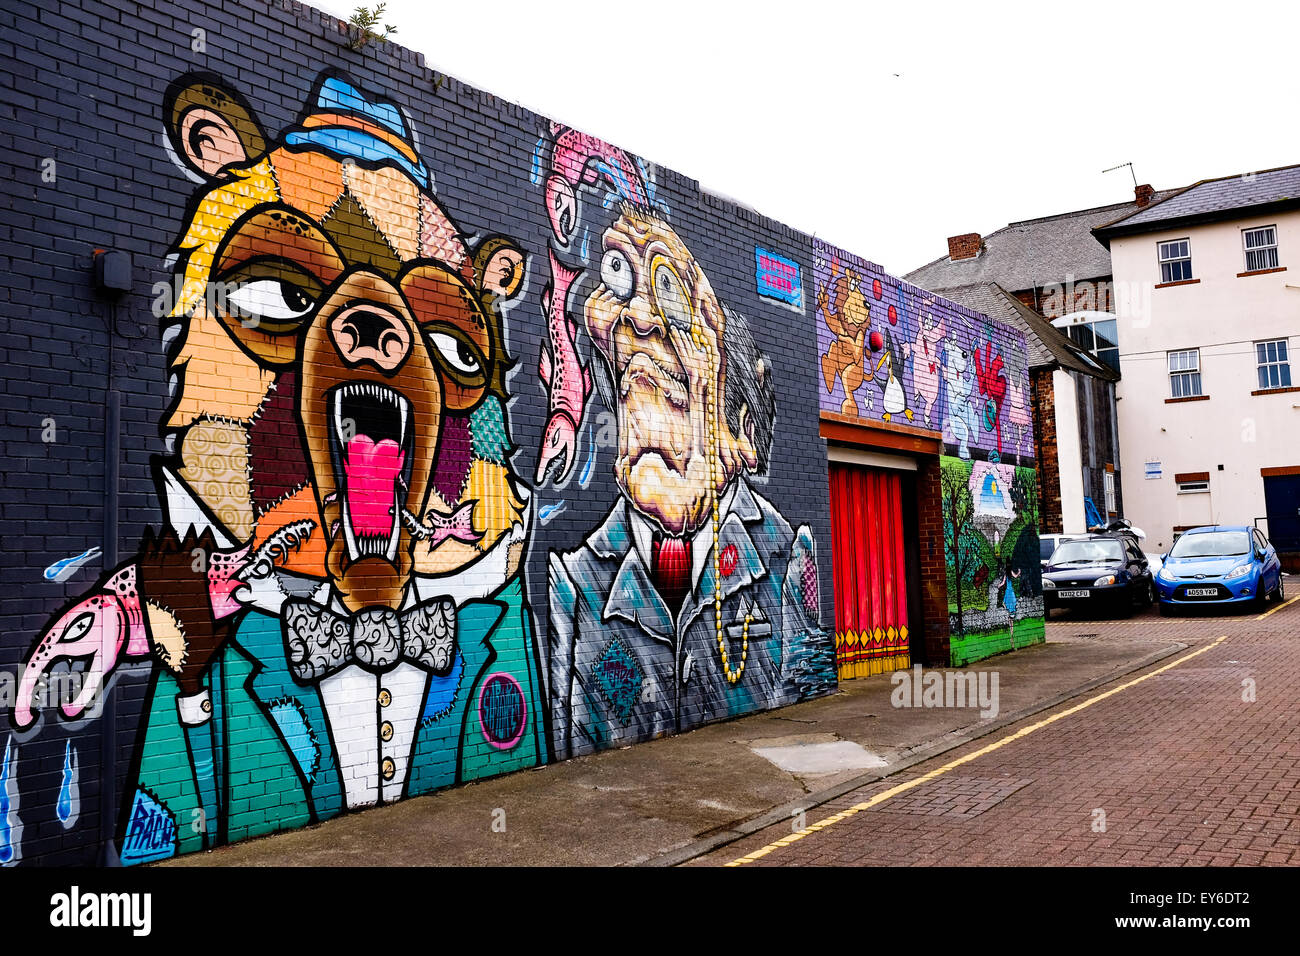 Graffiti wall uk - Graffiti Art On A Wall In Sunderland Uk Depicts A Bear And A Man